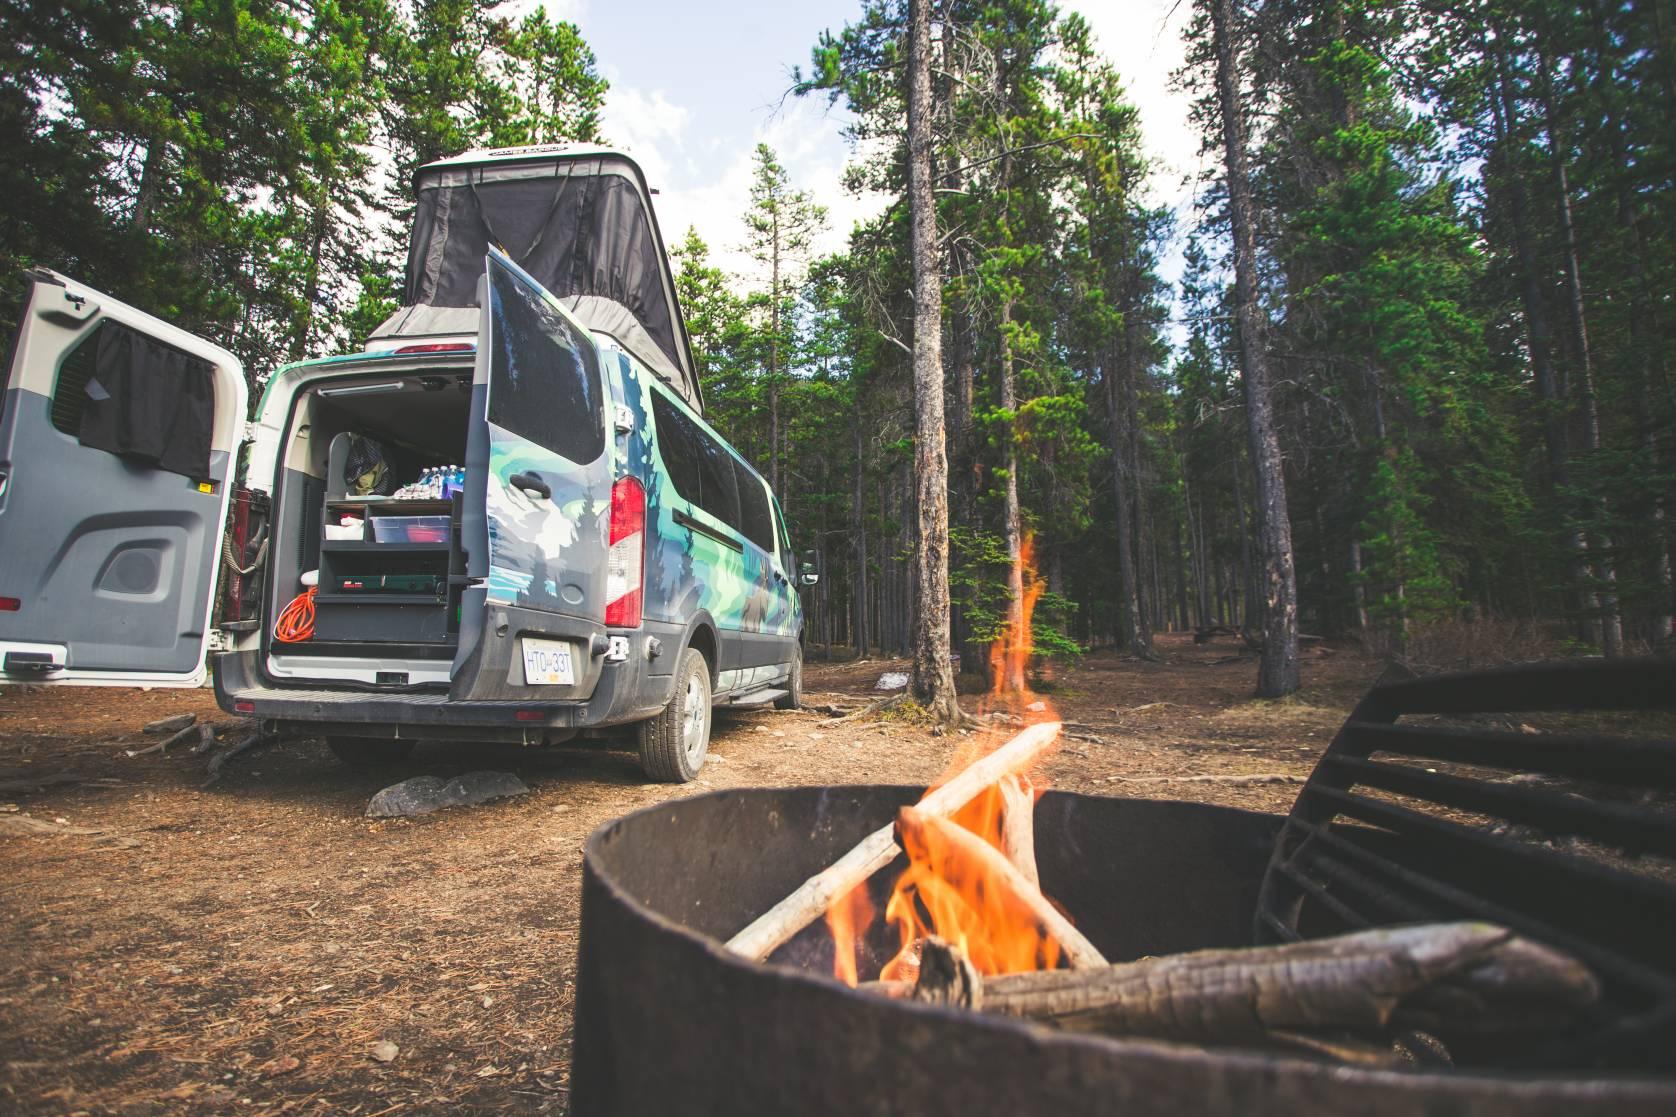 Escape_Campervan_Fire